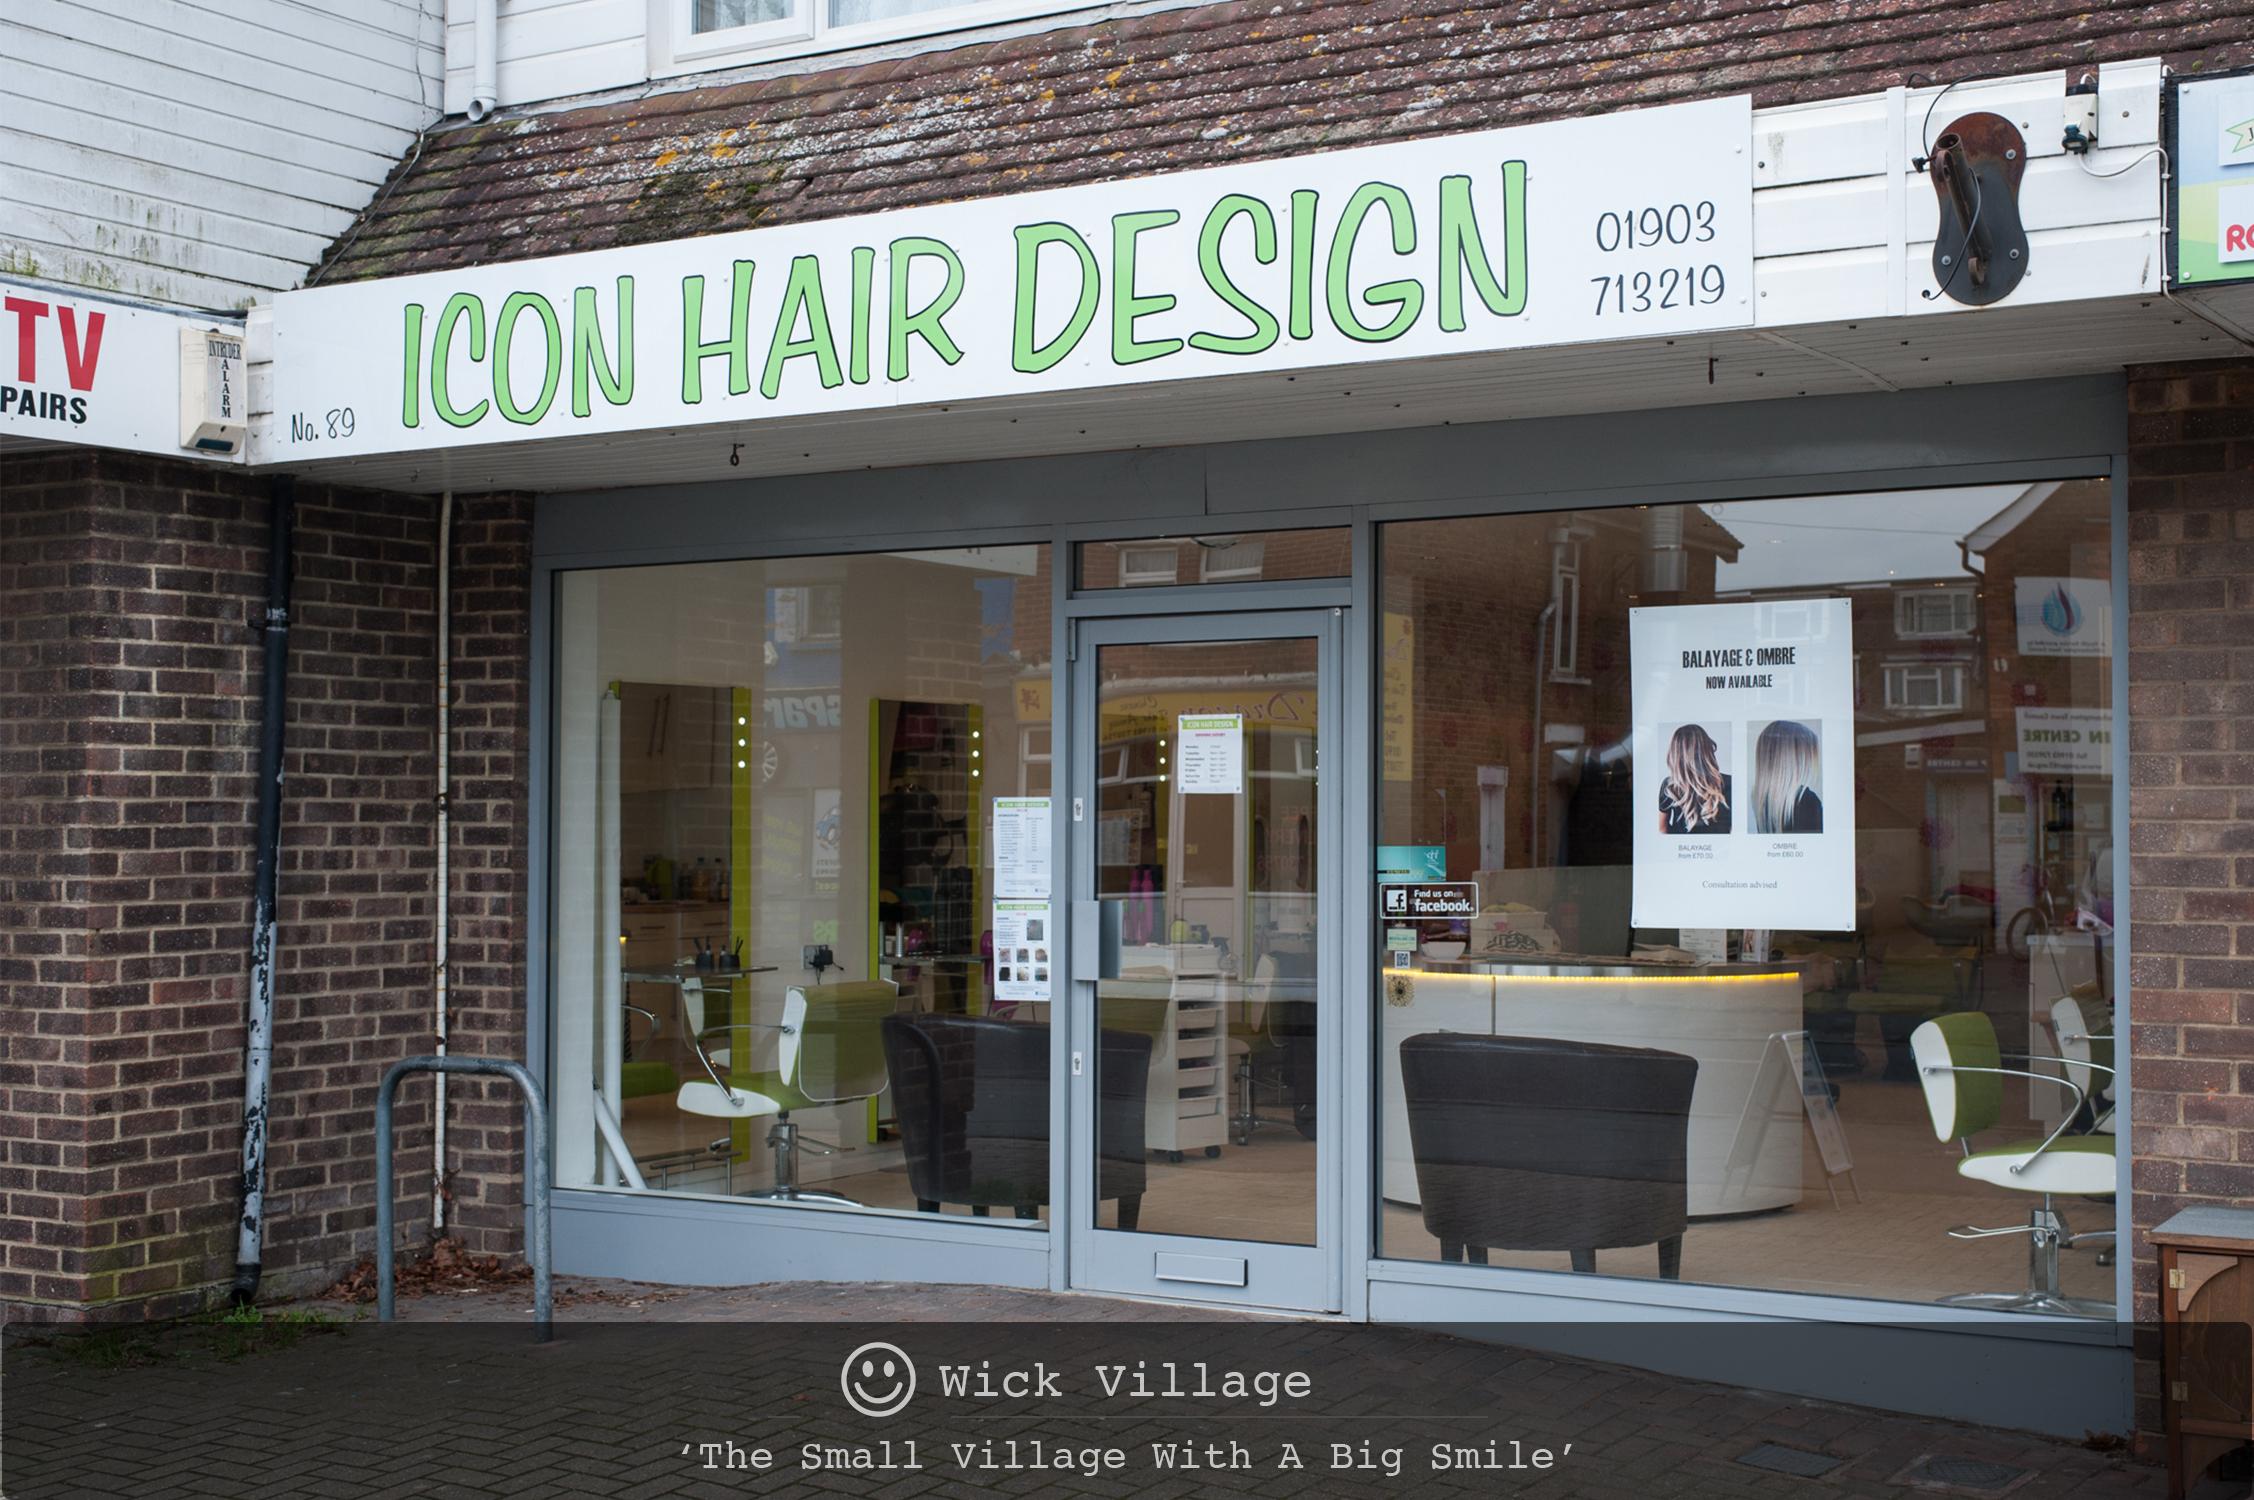 Icon Hair Design, Wick Village, Littlehampton.